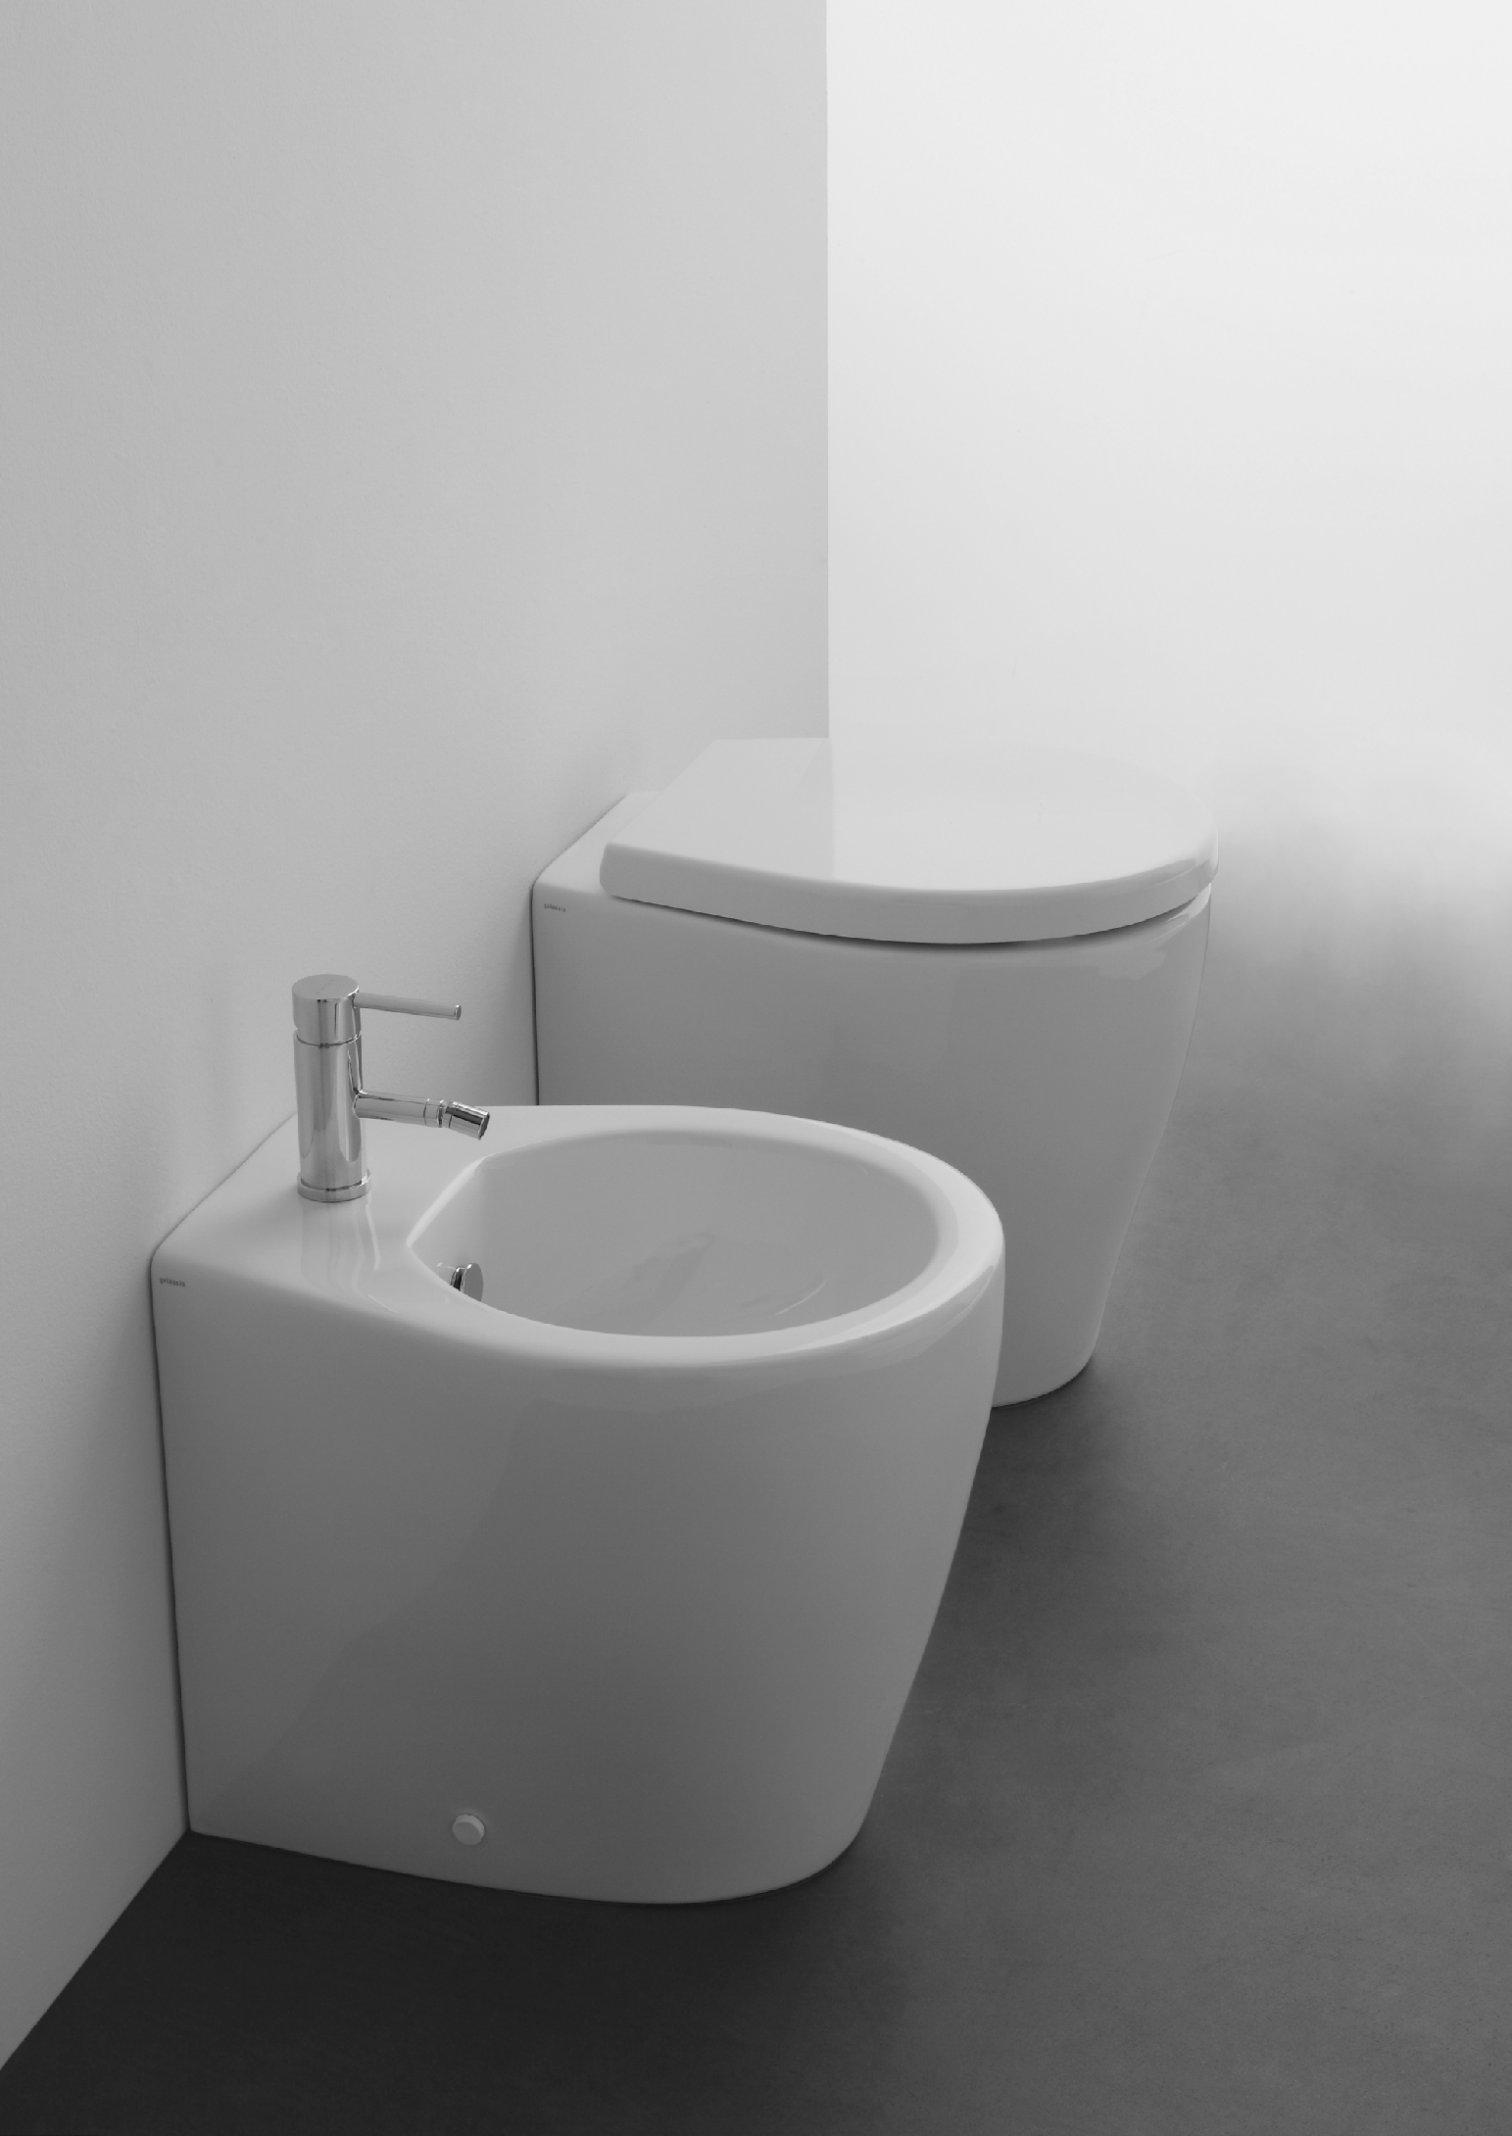 Galassia, Xes Sanitaryware